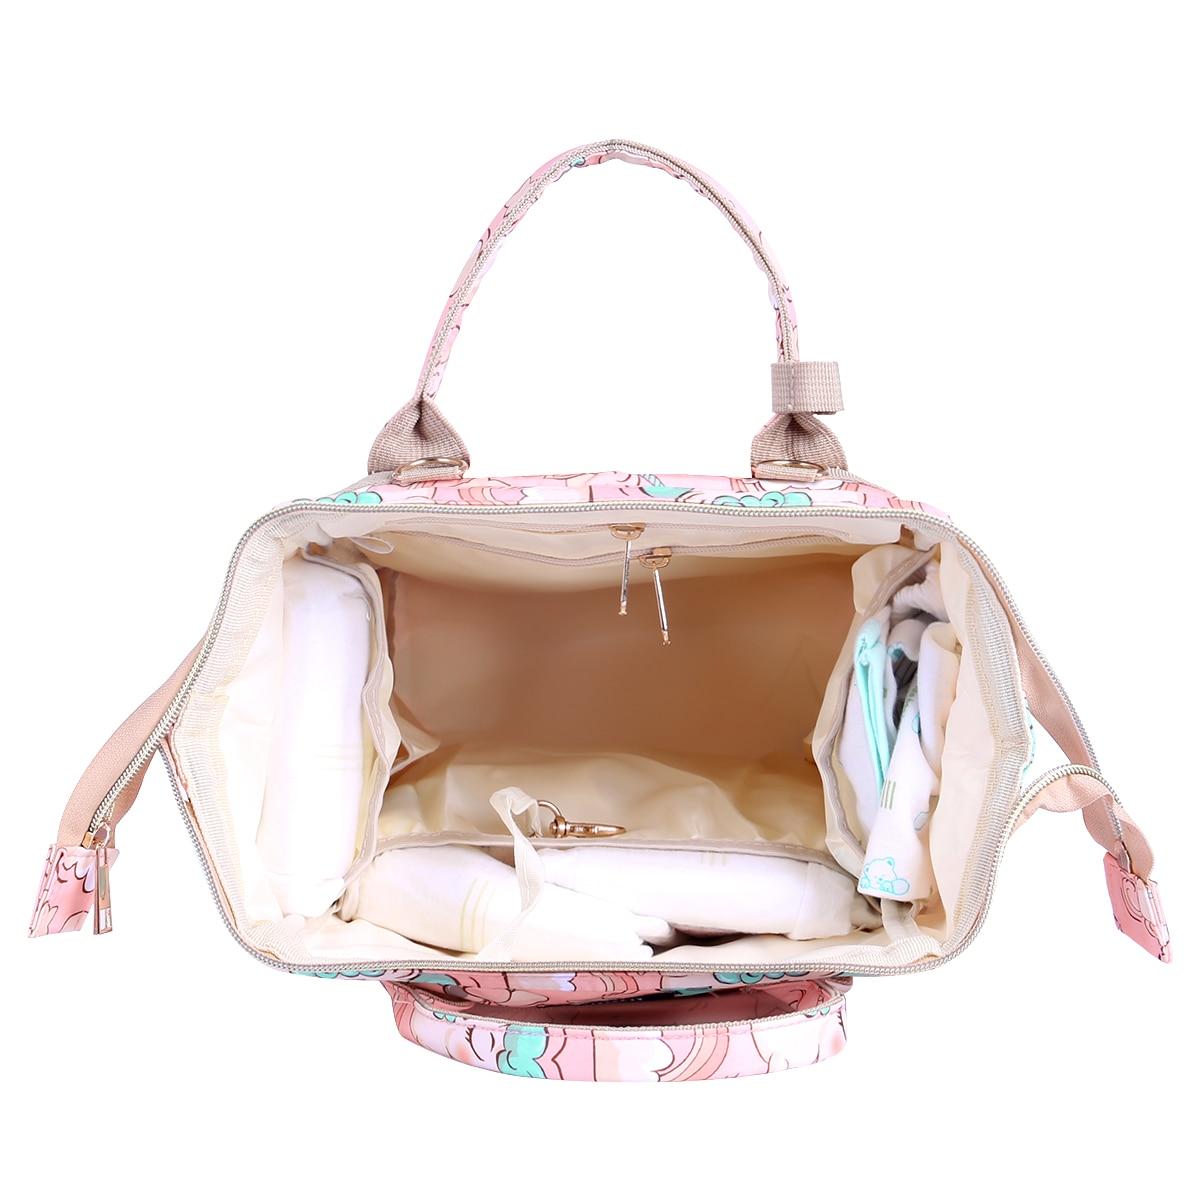 H35c4e497fdcf423da71f649baf739957p Diaper Bag Backpack For Moms Waterproof Large Capacity Stroller Diaper Organizer Unicorn Maternity Bags Nappy Changing Baby Bag